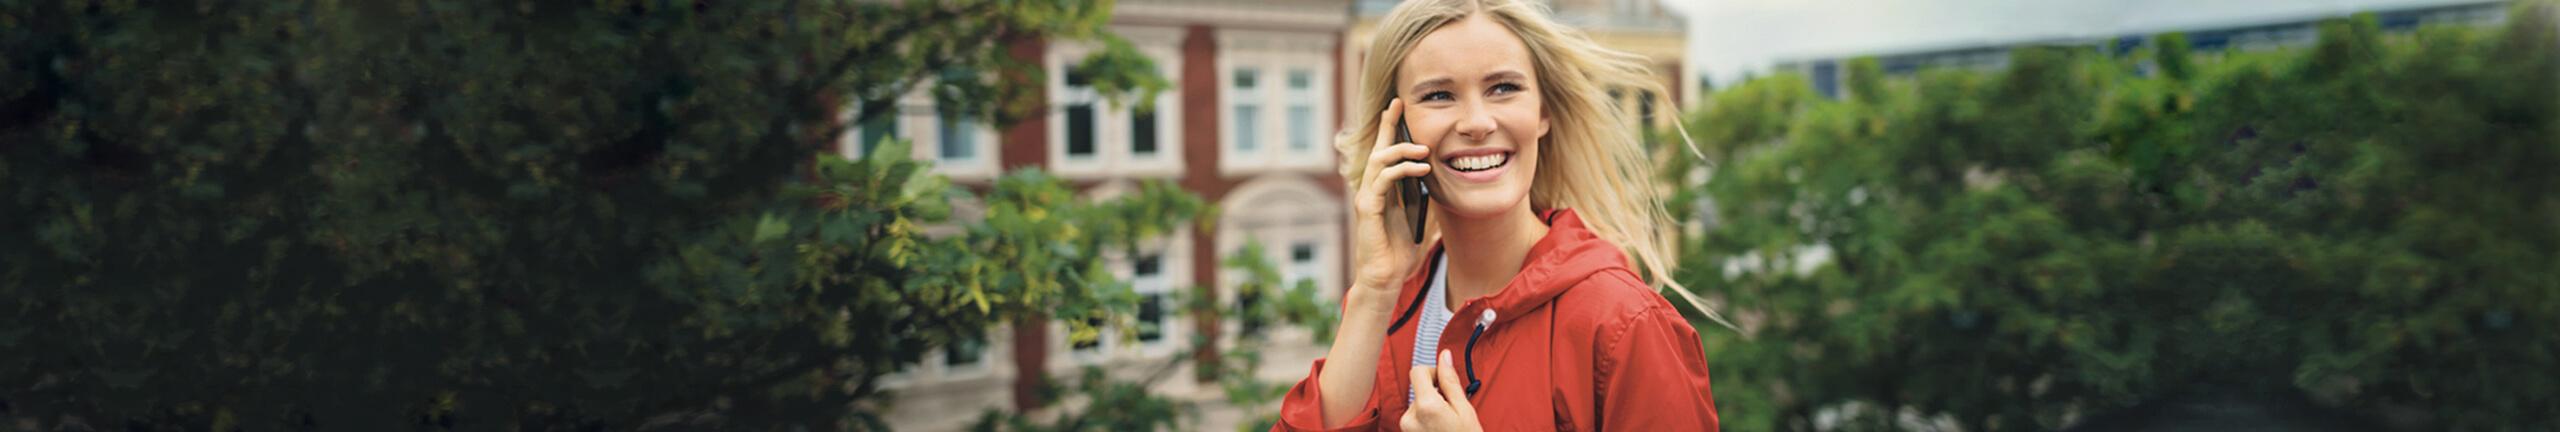 Entdecke Mobilfunk mit der Vodafone Gigabit-Company